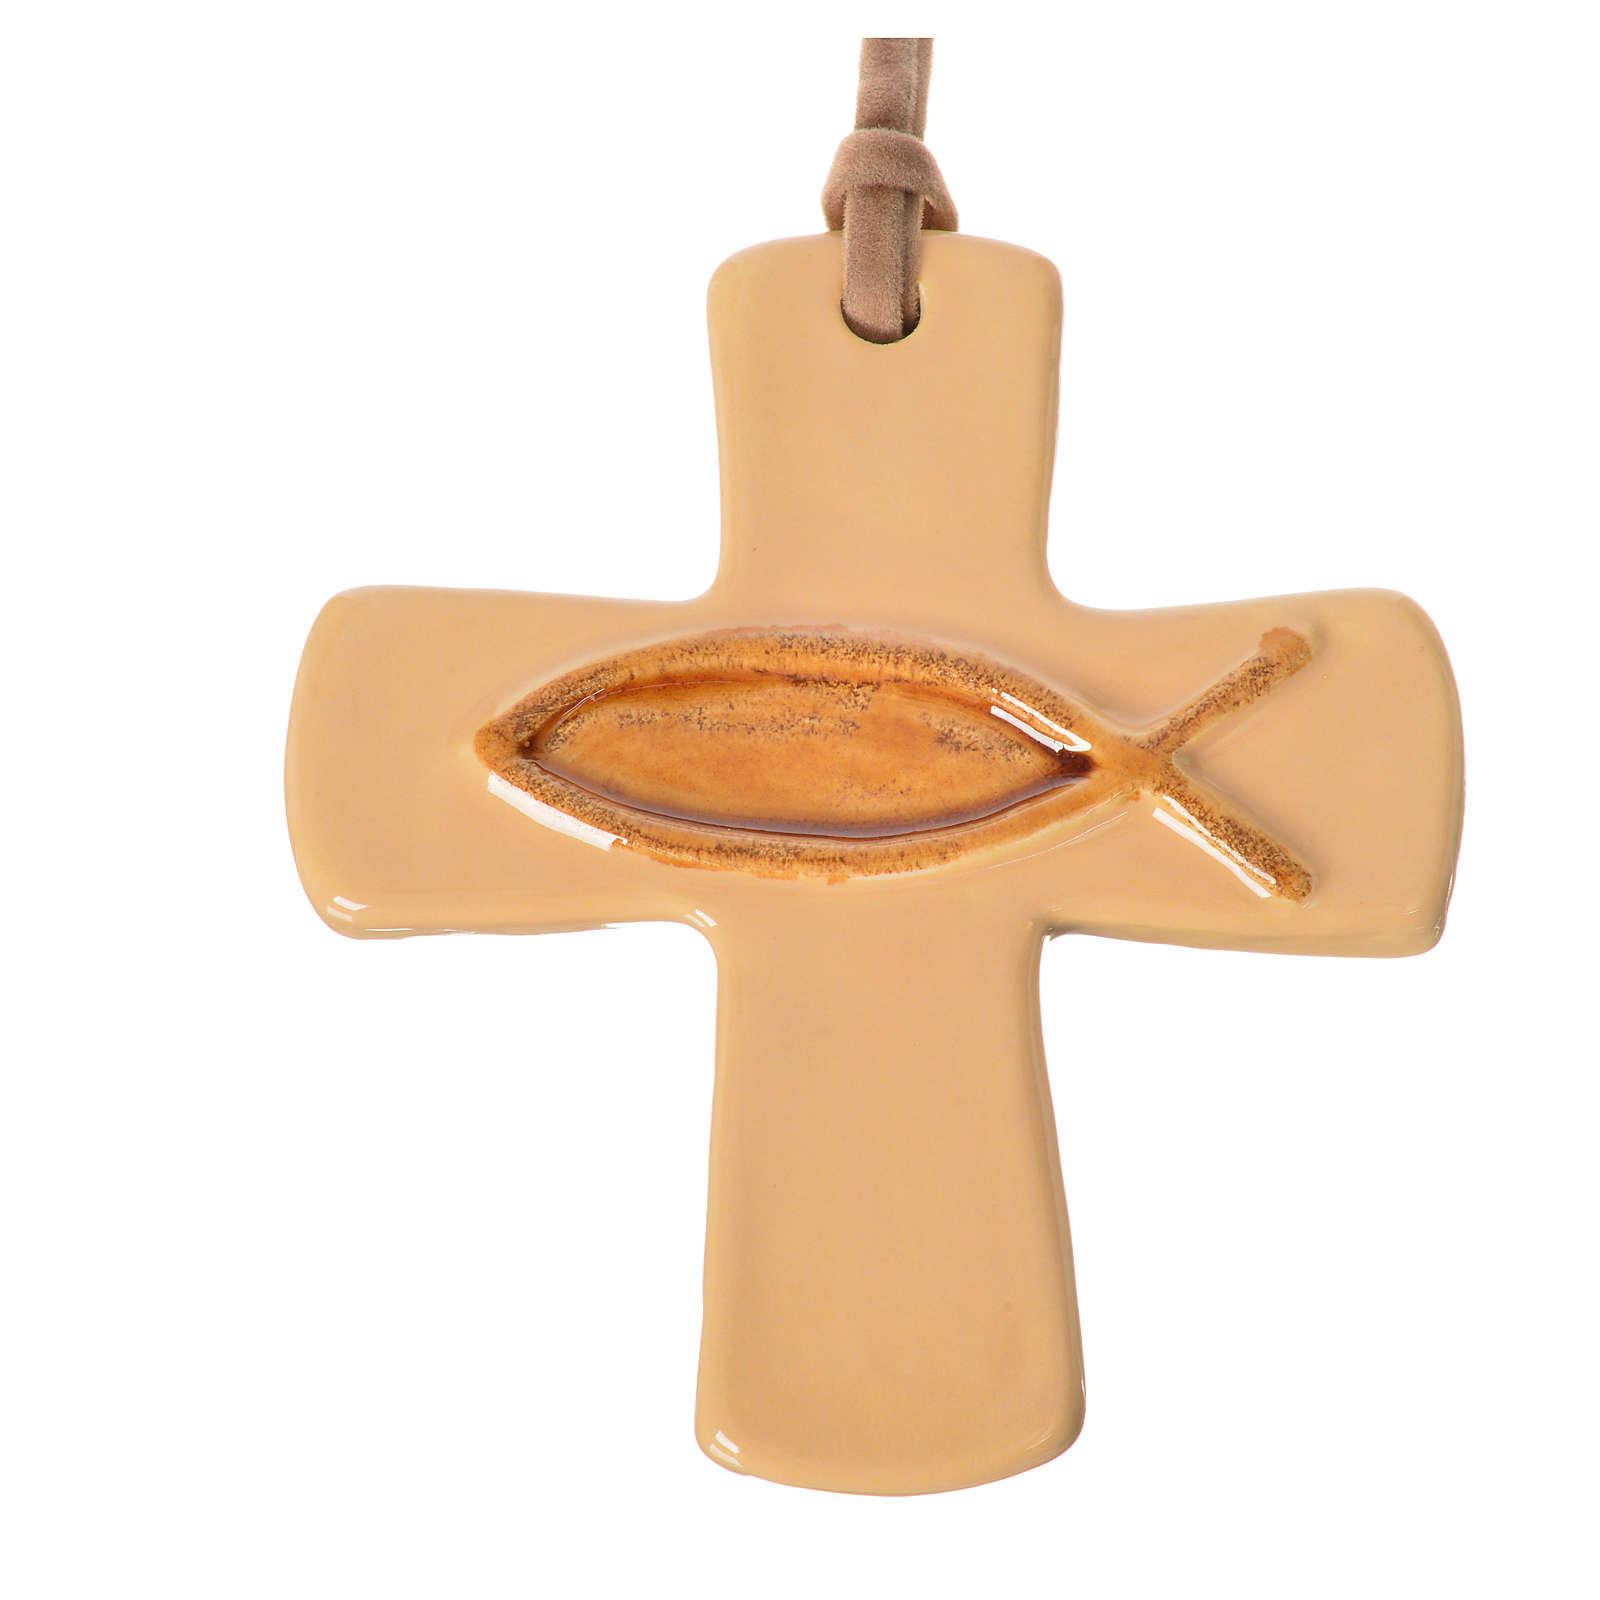 Croce ceramica artistica pesce avorio marrone 4